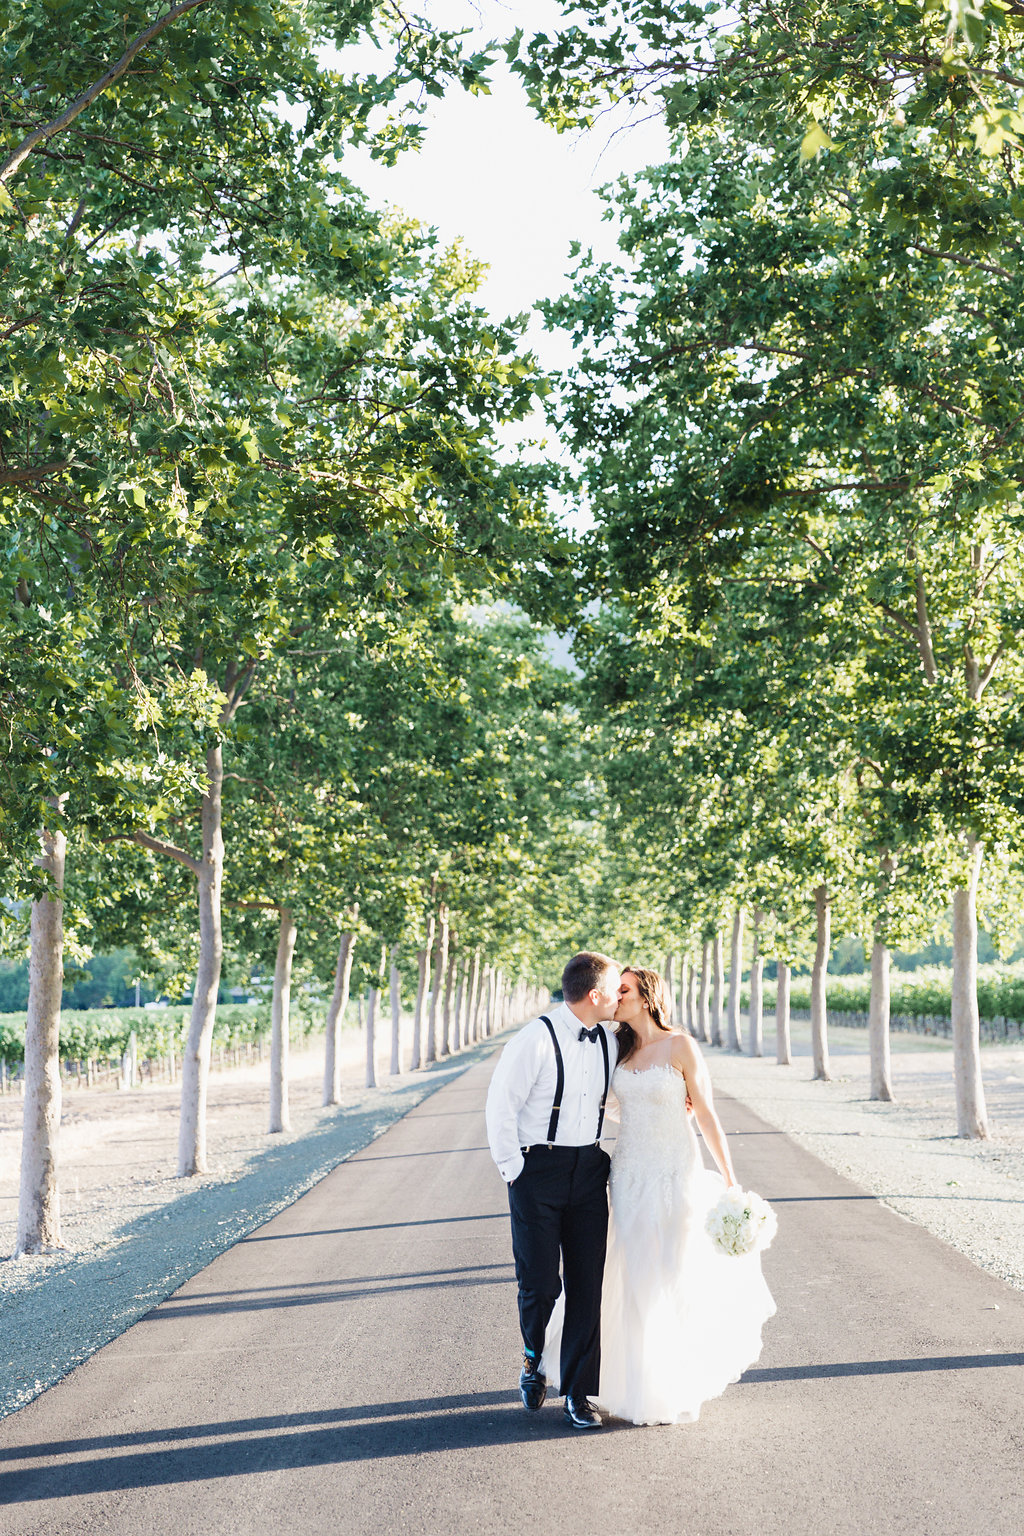 Beaulieu Garden, Napa wedding, wedding photo in wine country